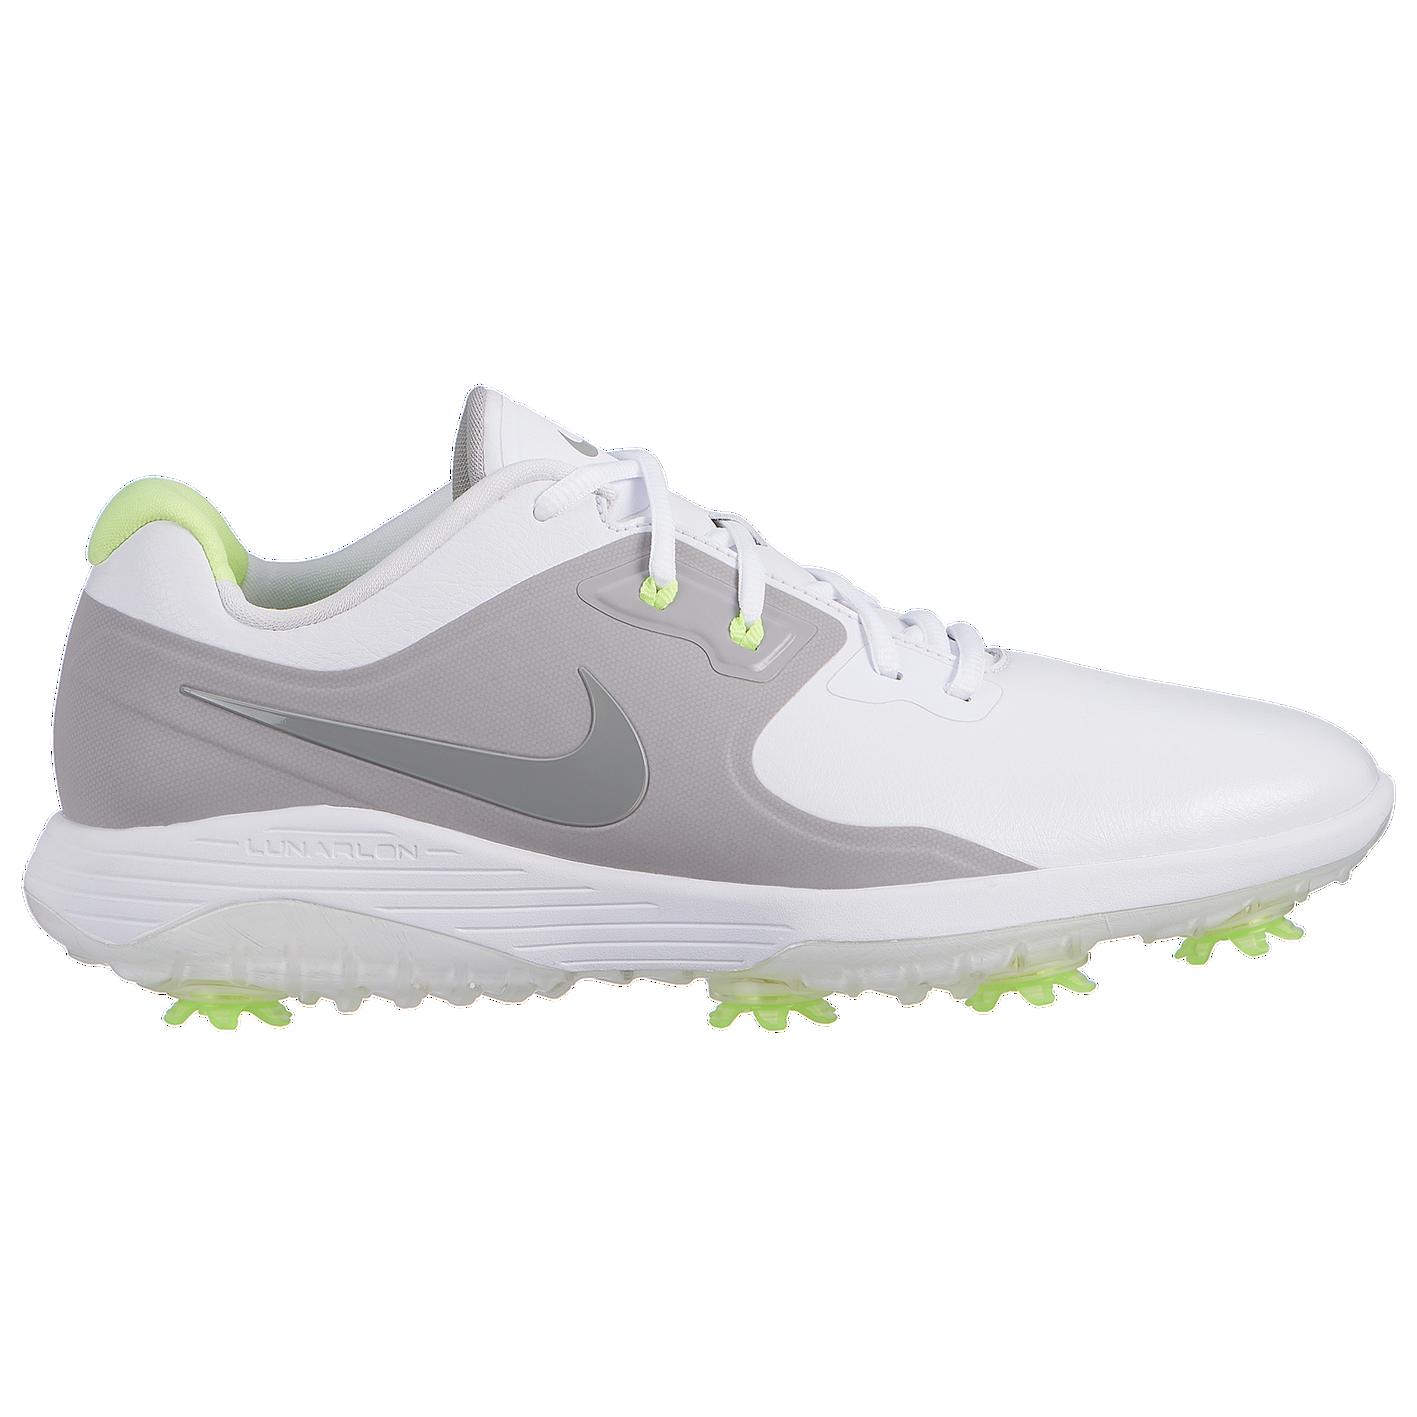 289bf8dd9a1 Nike Vapor Pro Golf Shoes - Men s - Golf - Shoes - White Medium Grey ...